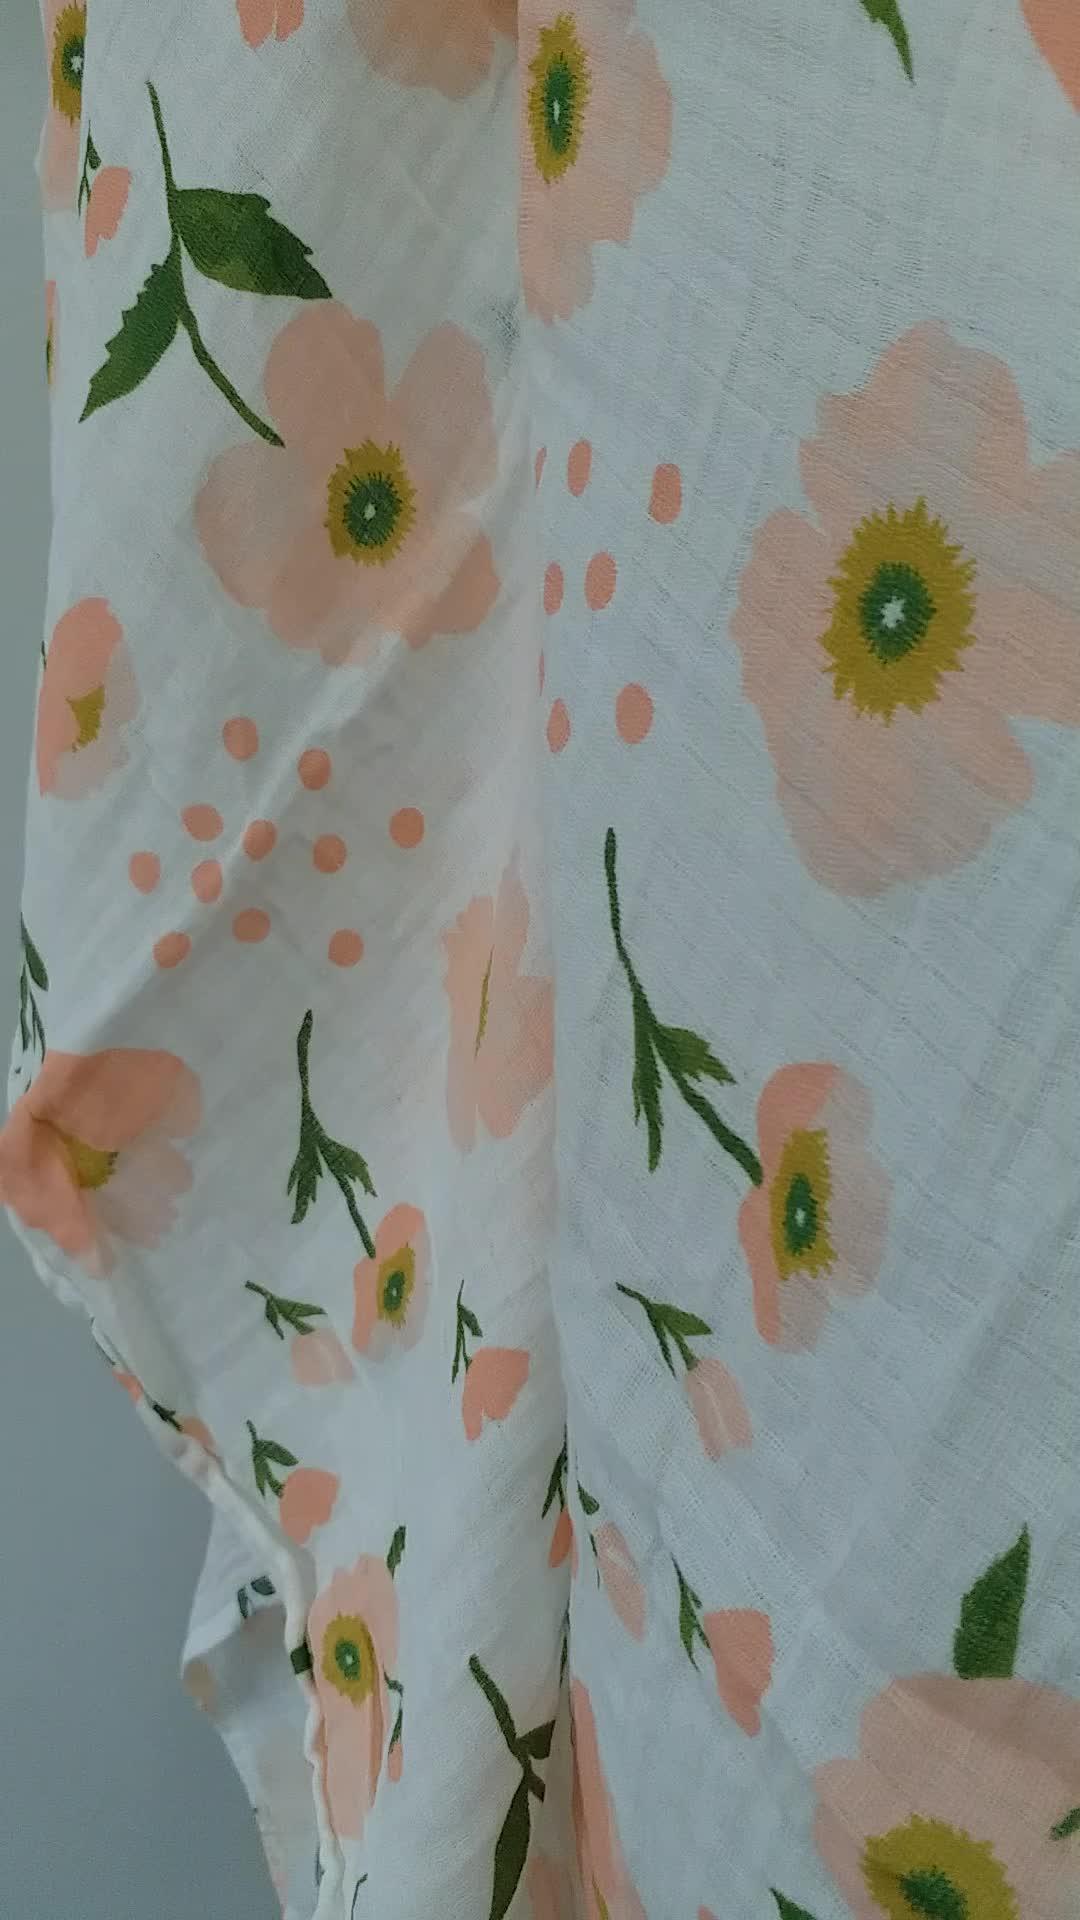 100% Muslin Organic Cotton Newborn Baby Swaddles Blankets Gauze Infant Wrap Sleepsack Stroller Cover Swaddle Blanket